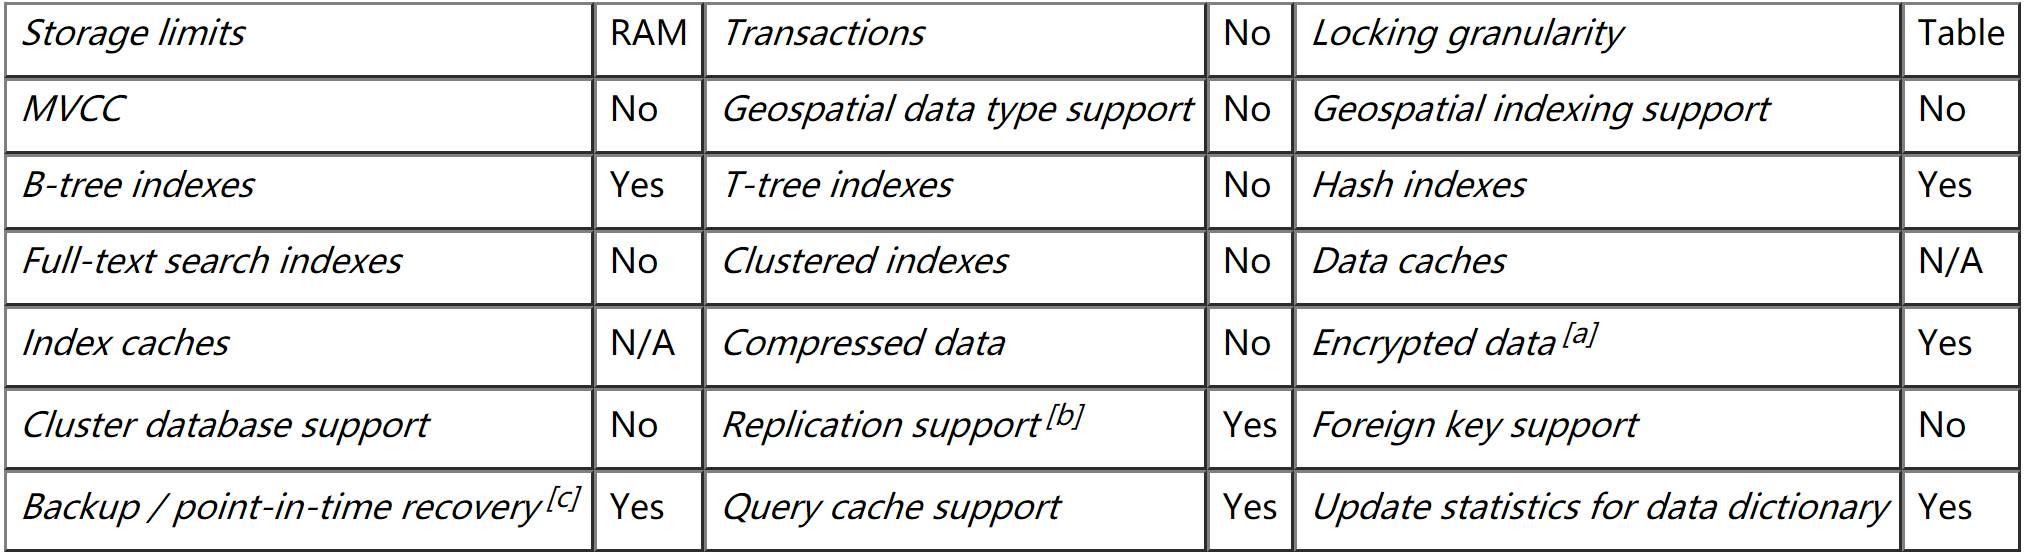 MySQL MEMORY 引擎及性能比对